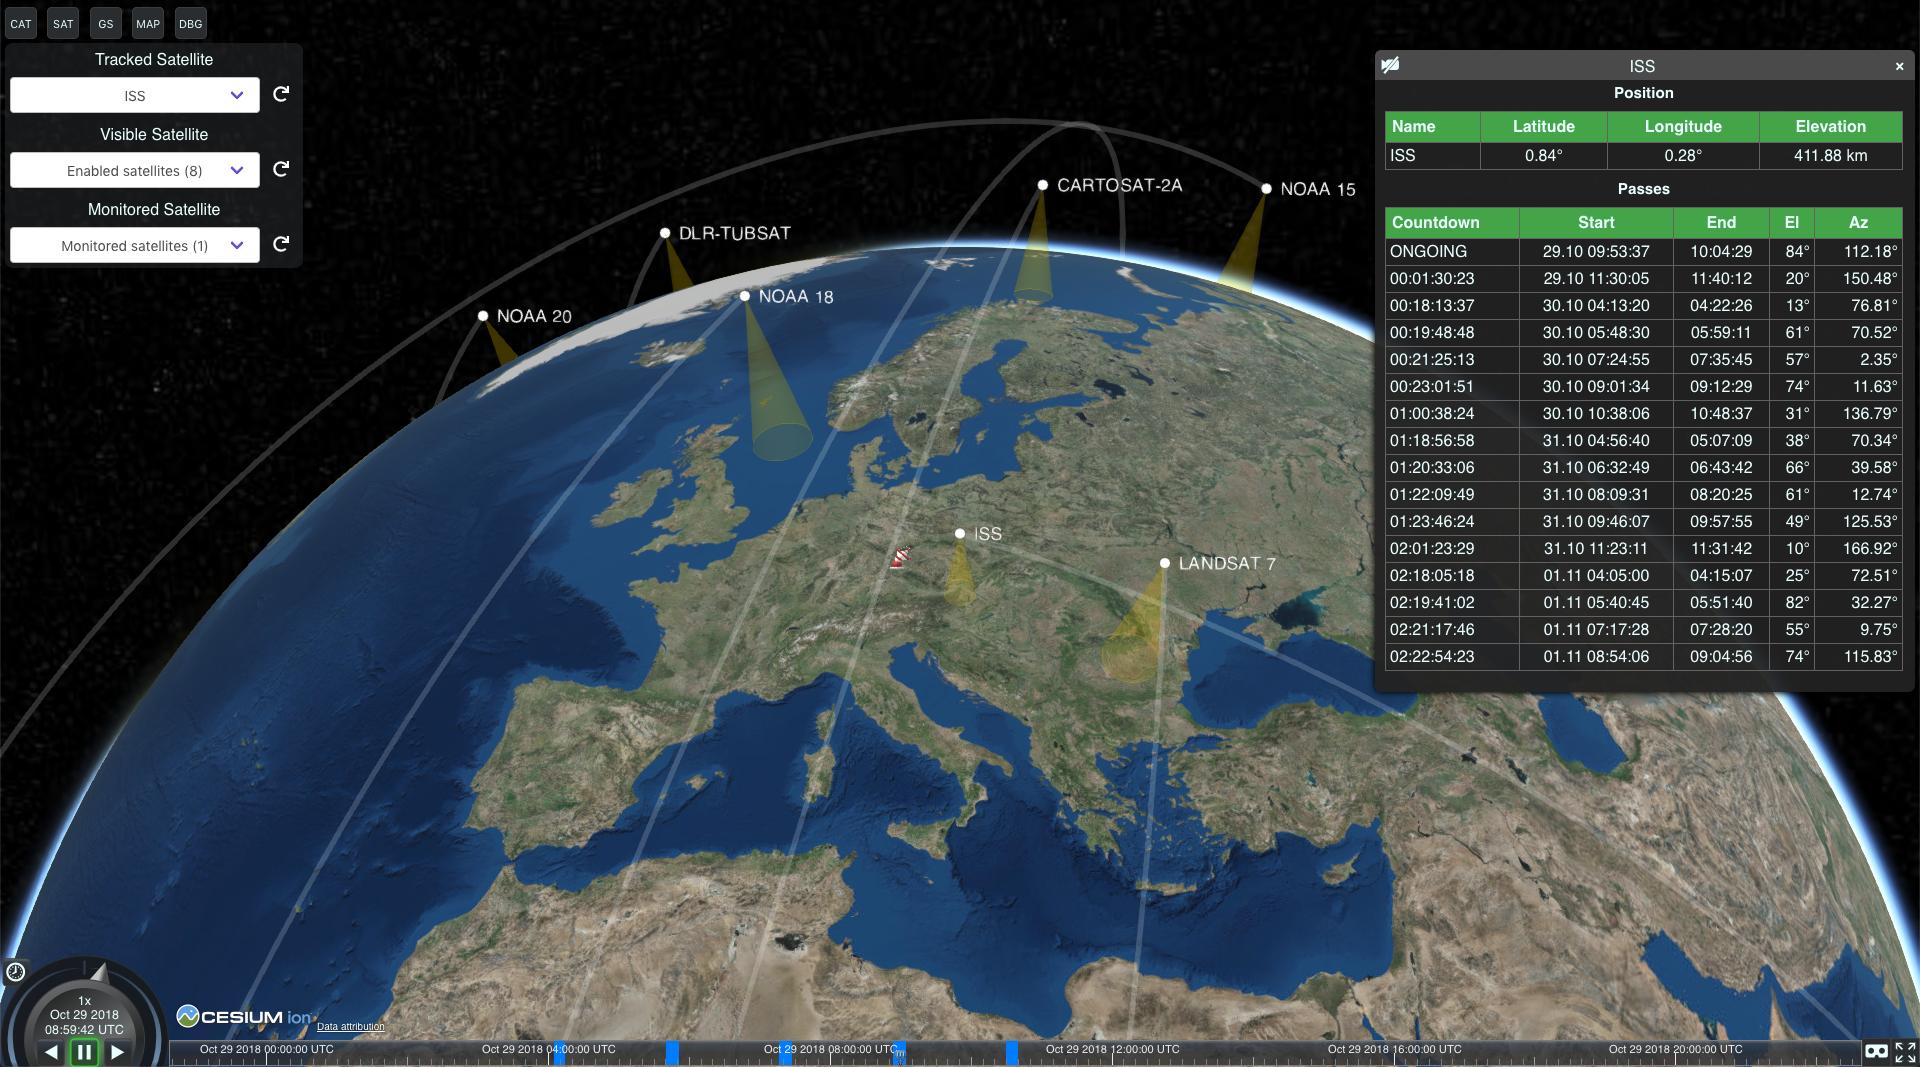 GitHub - Flowm/satvis: Satellite orbit visualization and pass